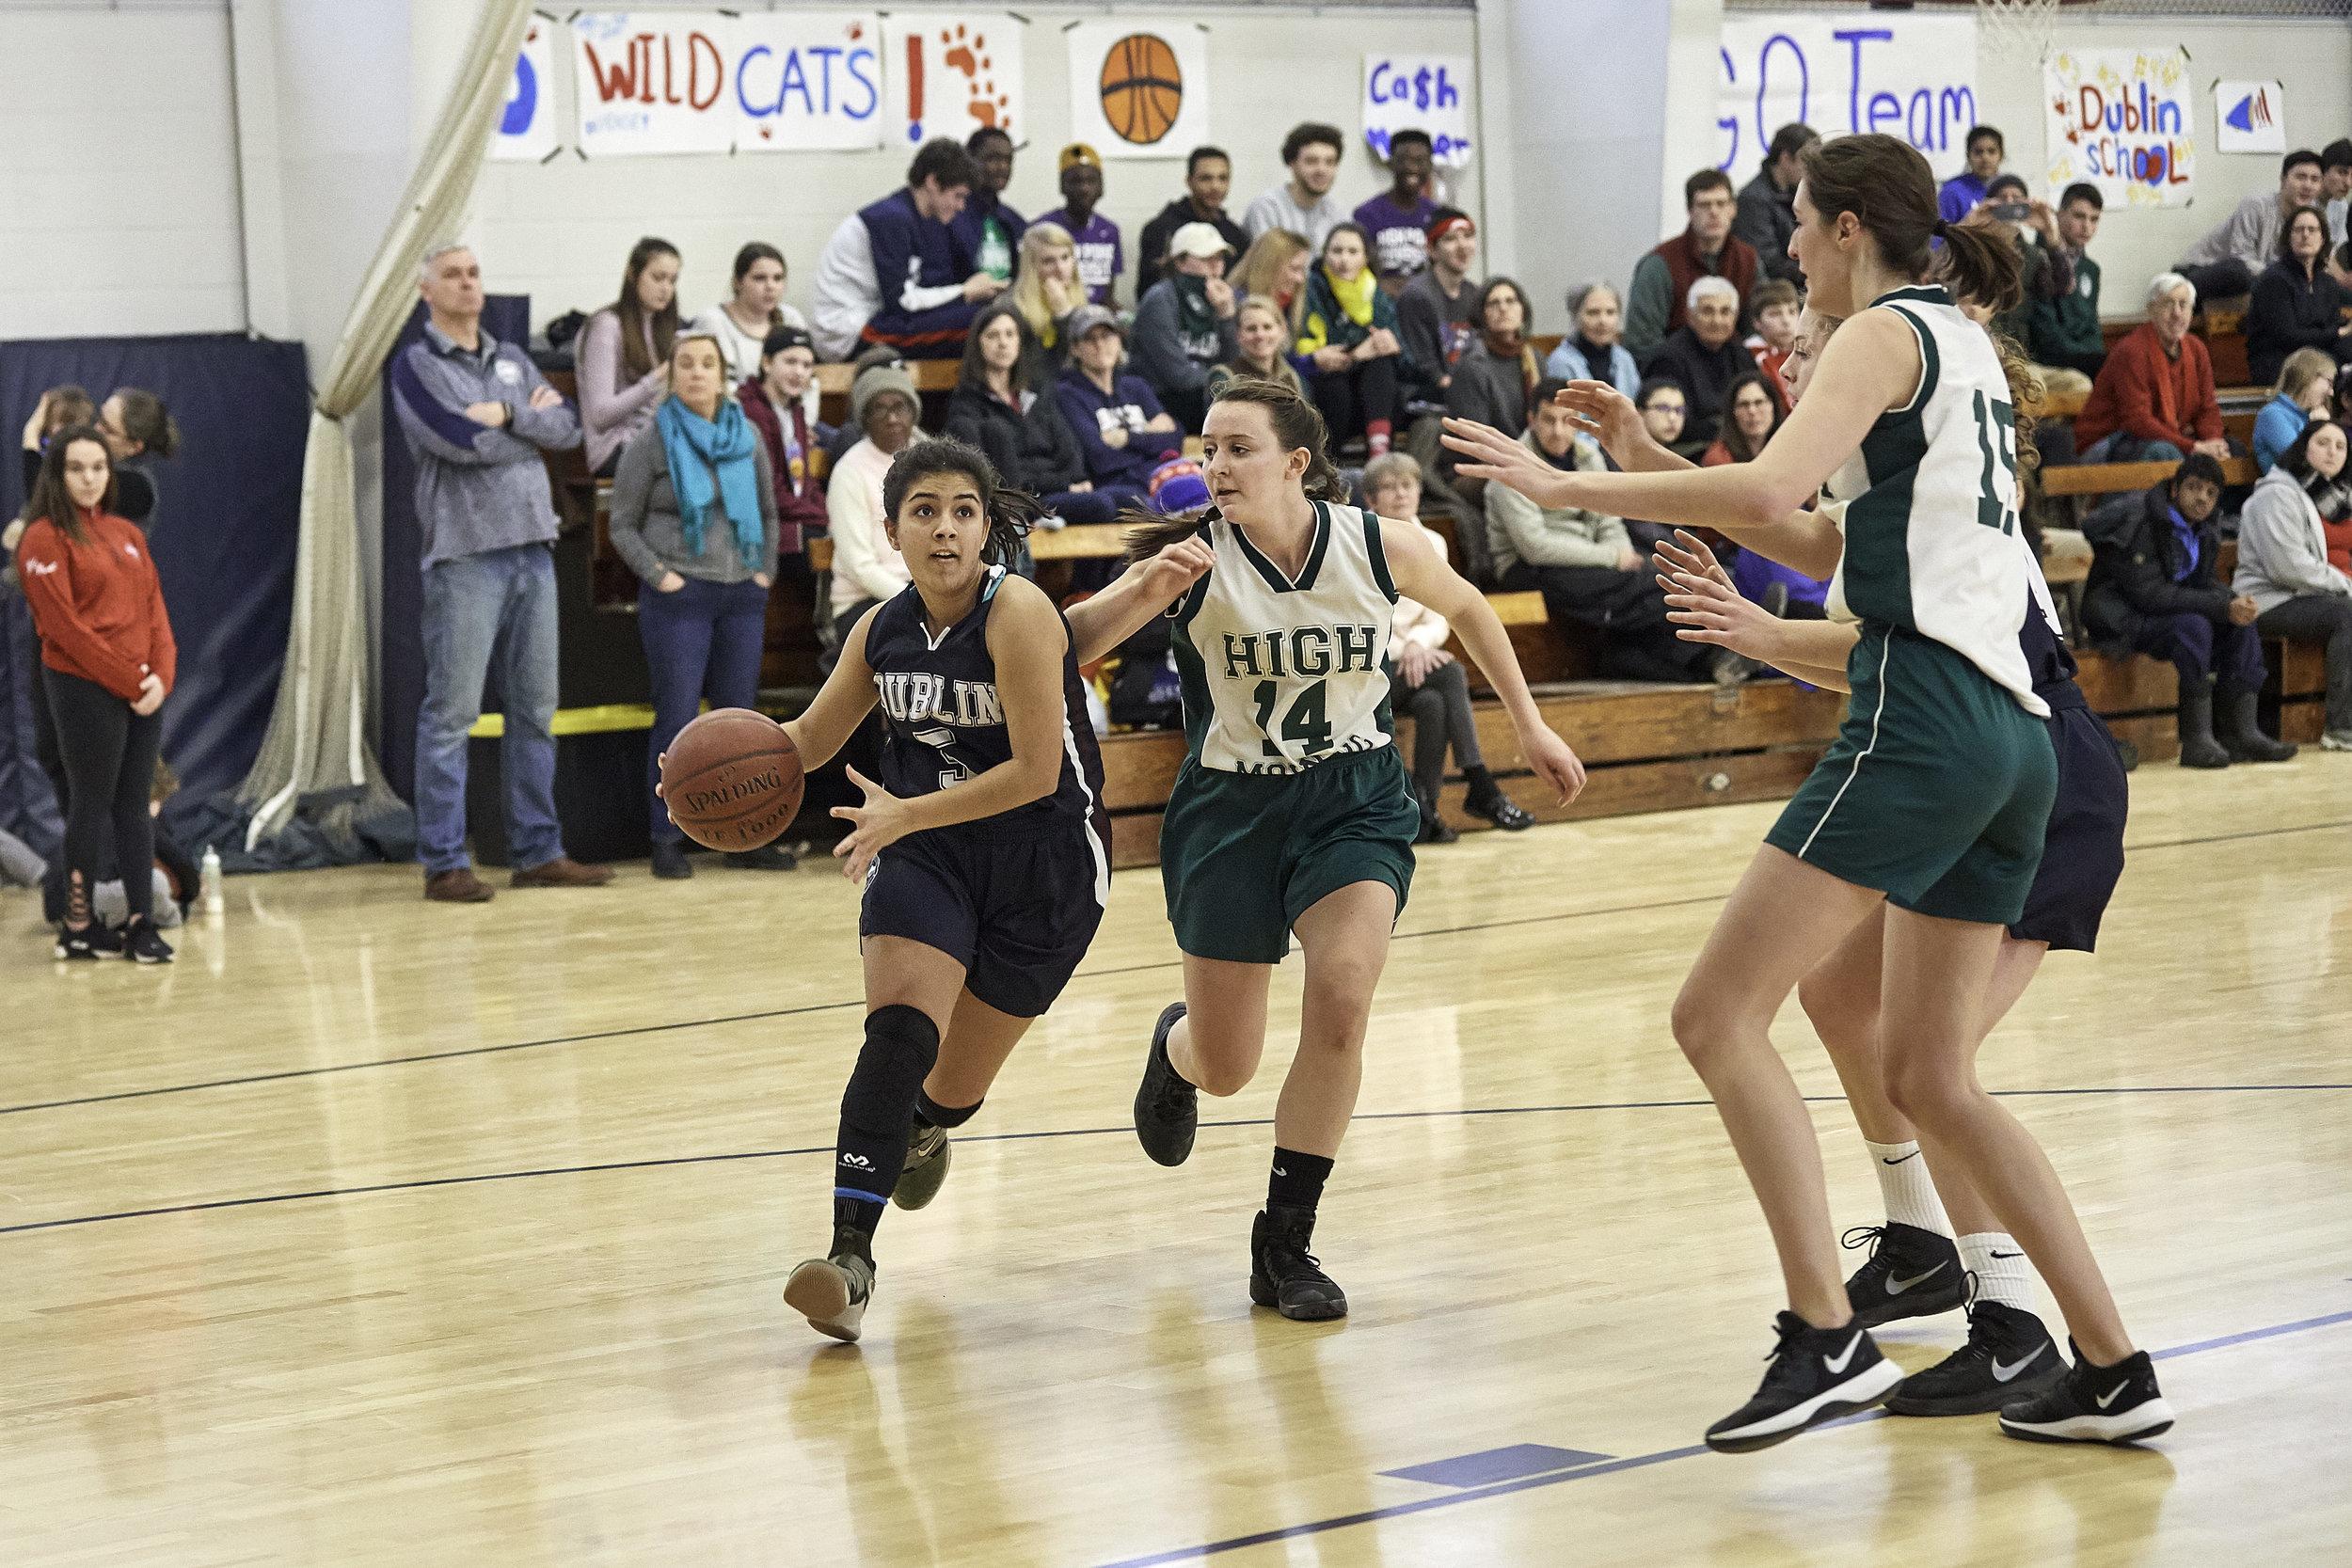 Basketball vs High Mowing School, February 2, 2019 - 166372.jpg